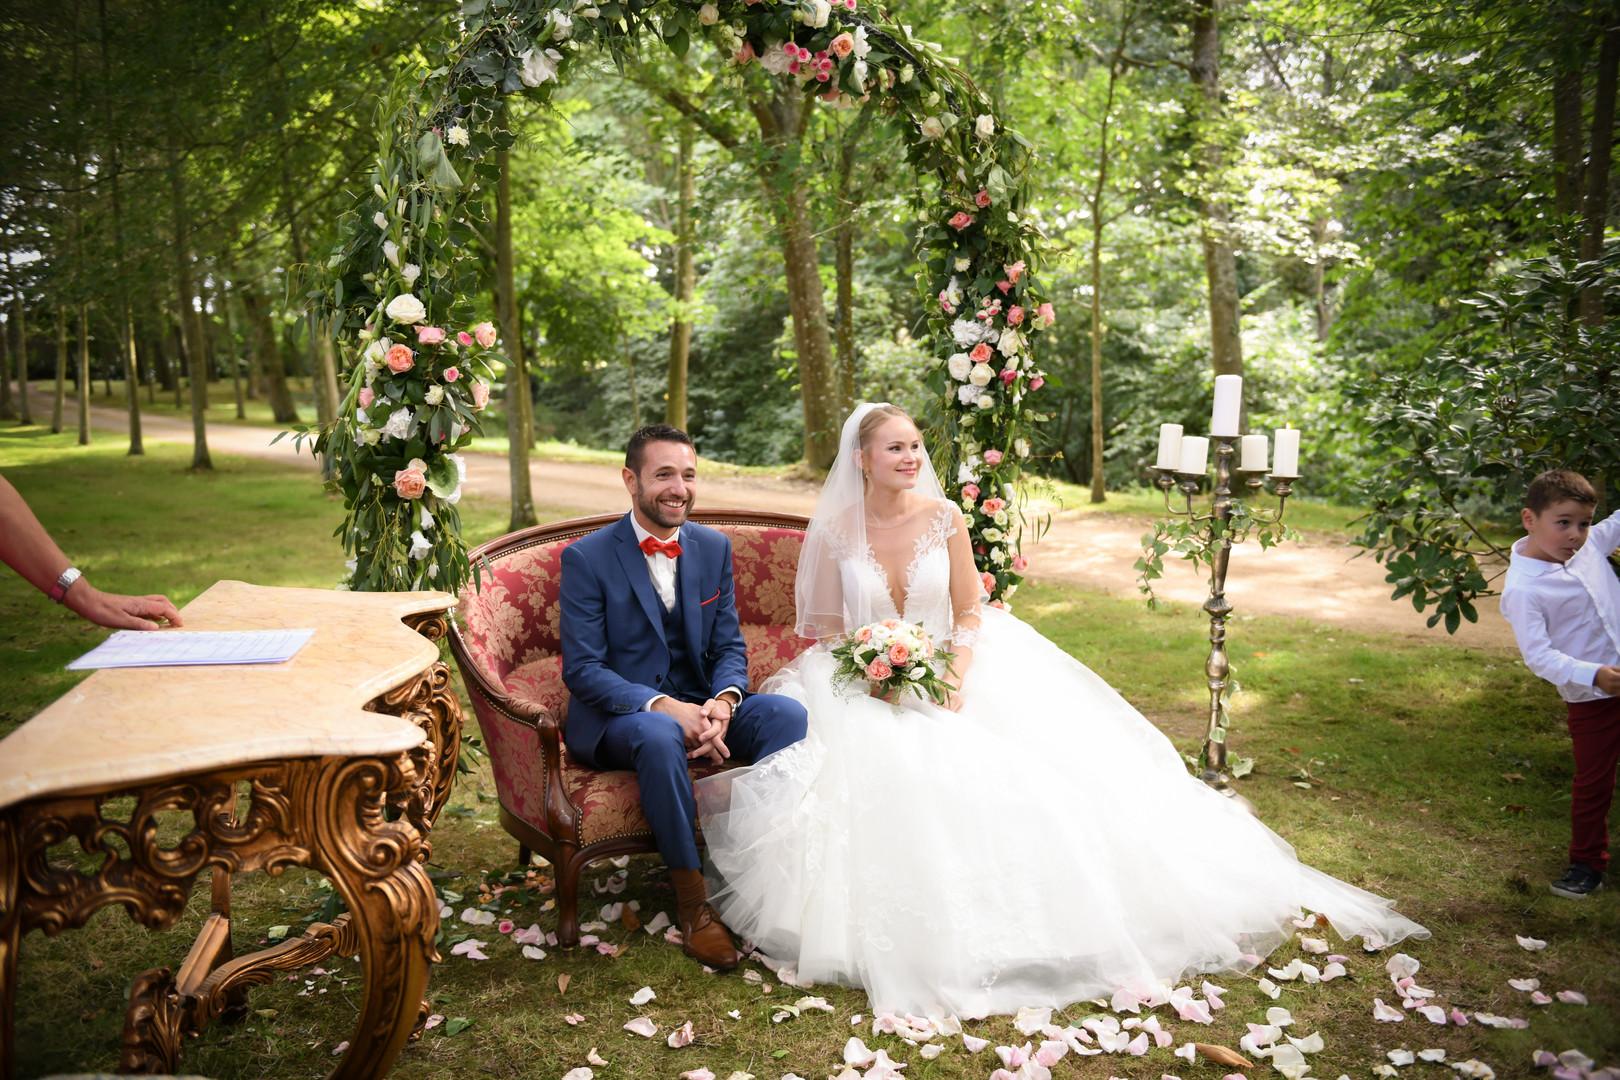 Mariage Fannouchette et garrychon  24 AO